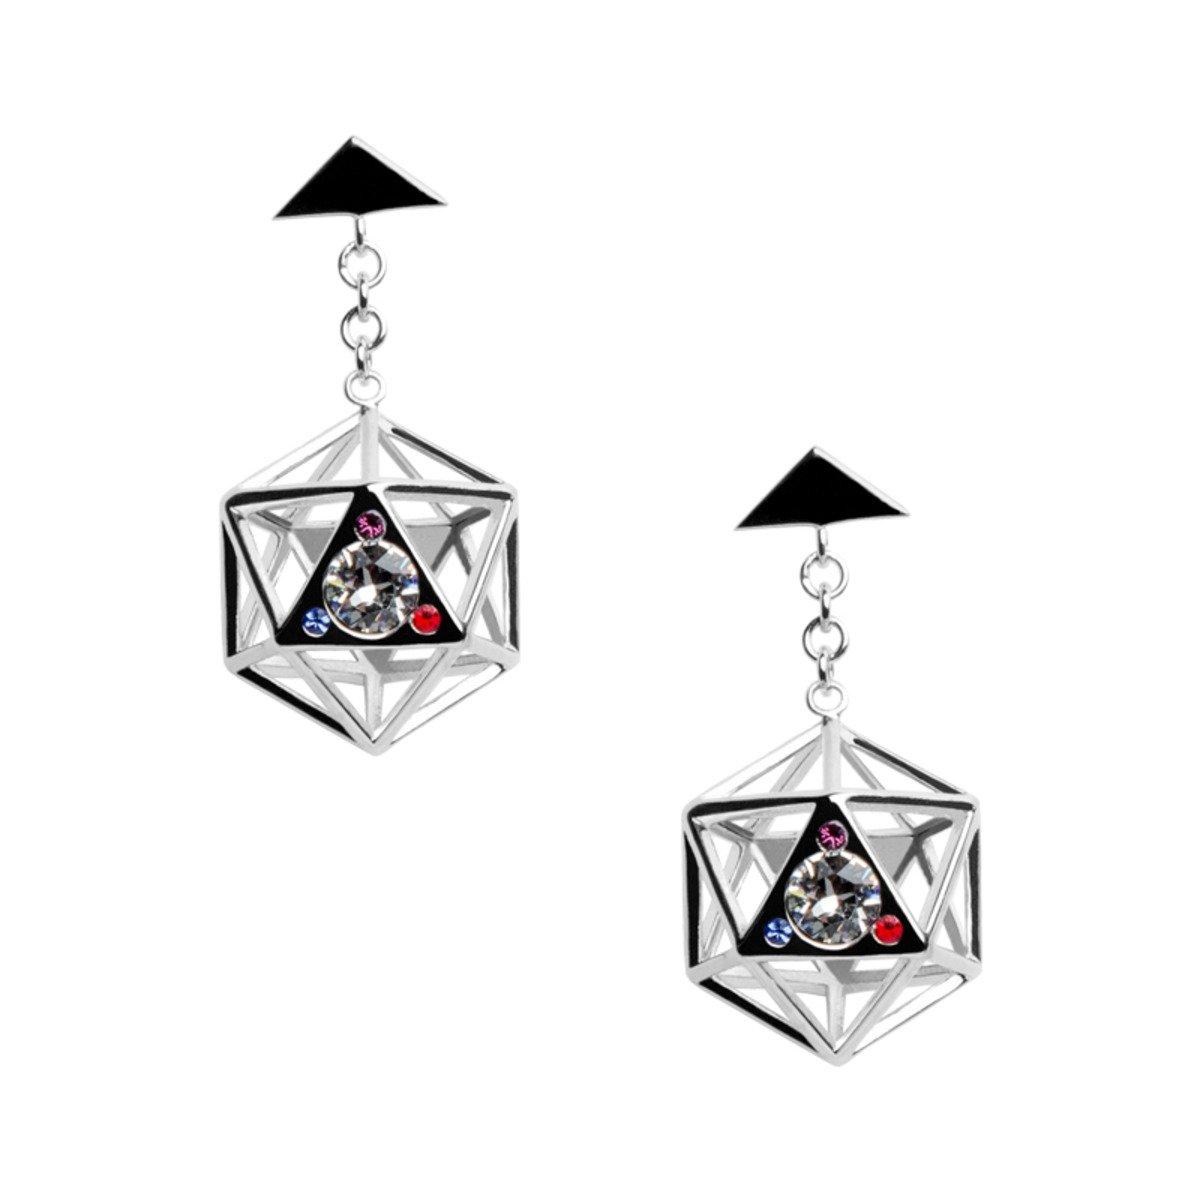 Icosahedron 925 純銀 耳環